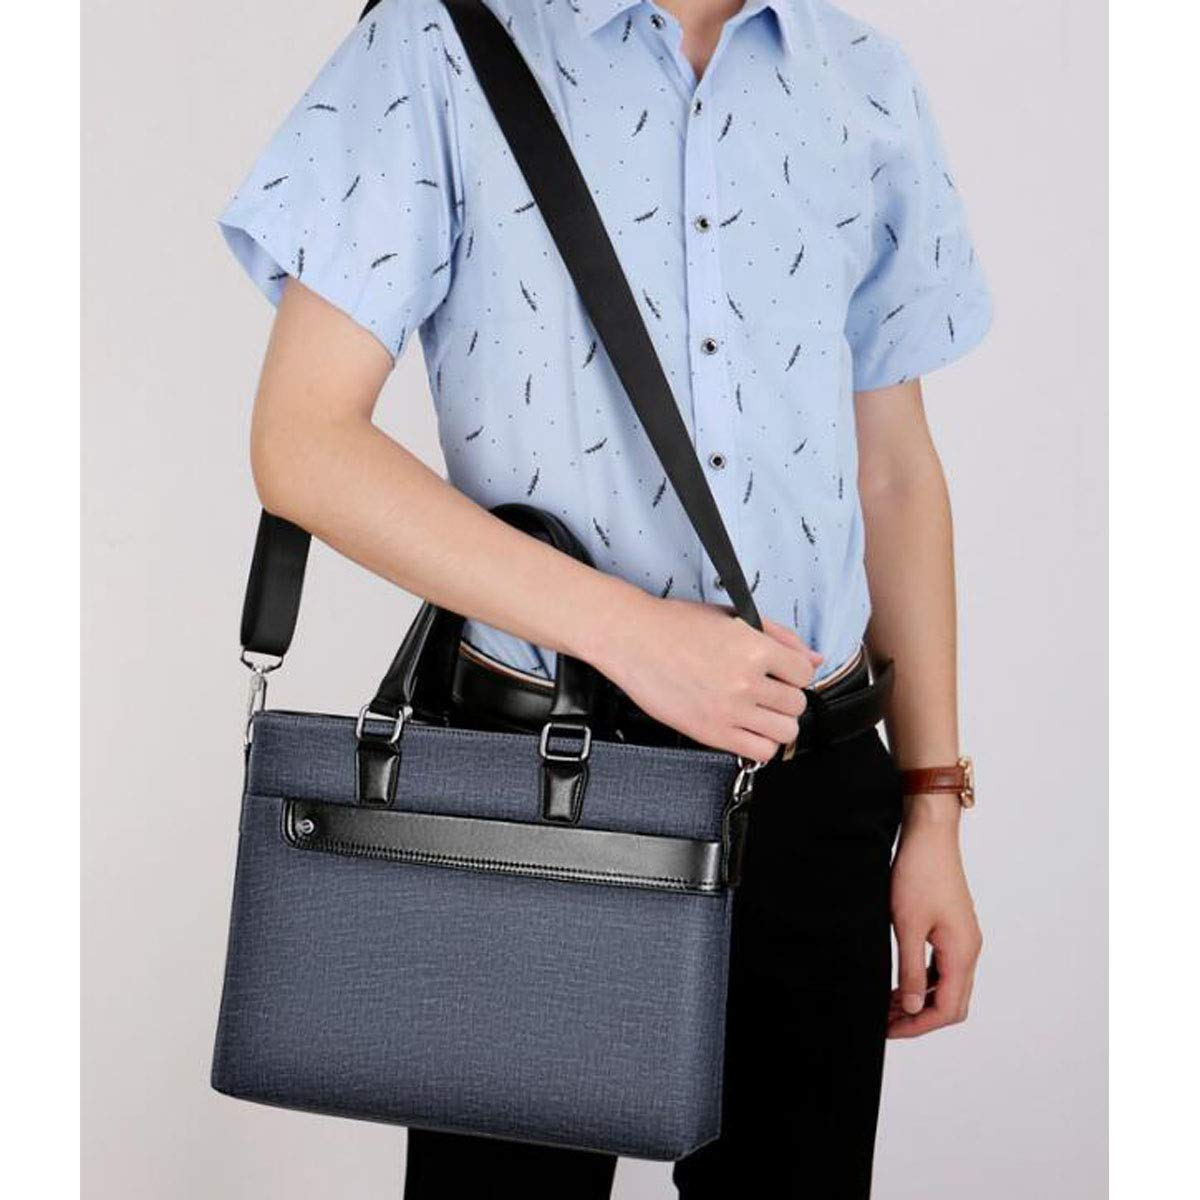 Yougou01 Briefcase Business Travel Suitable for Travel Color : Black Etc Blue Size: 35726cm Quality Assured 2019 New Cross-Section Mens Handbag